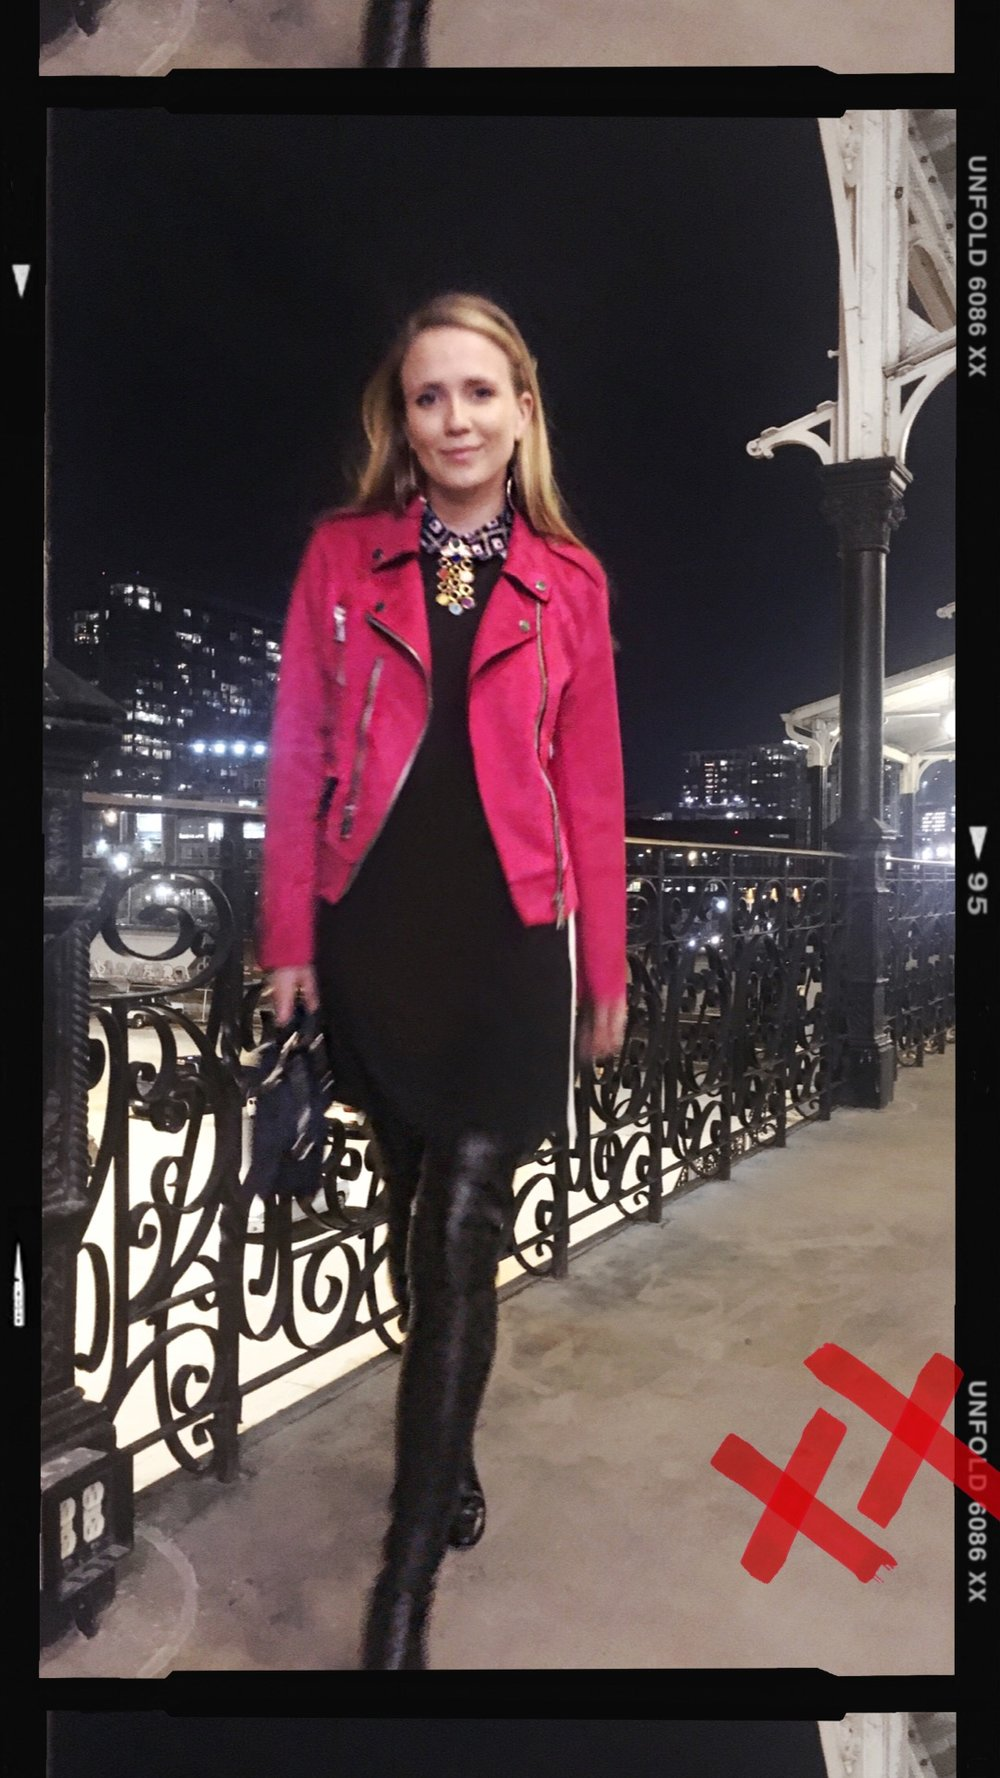 nashville-fashion-week-kickoff-party-2019.JPG